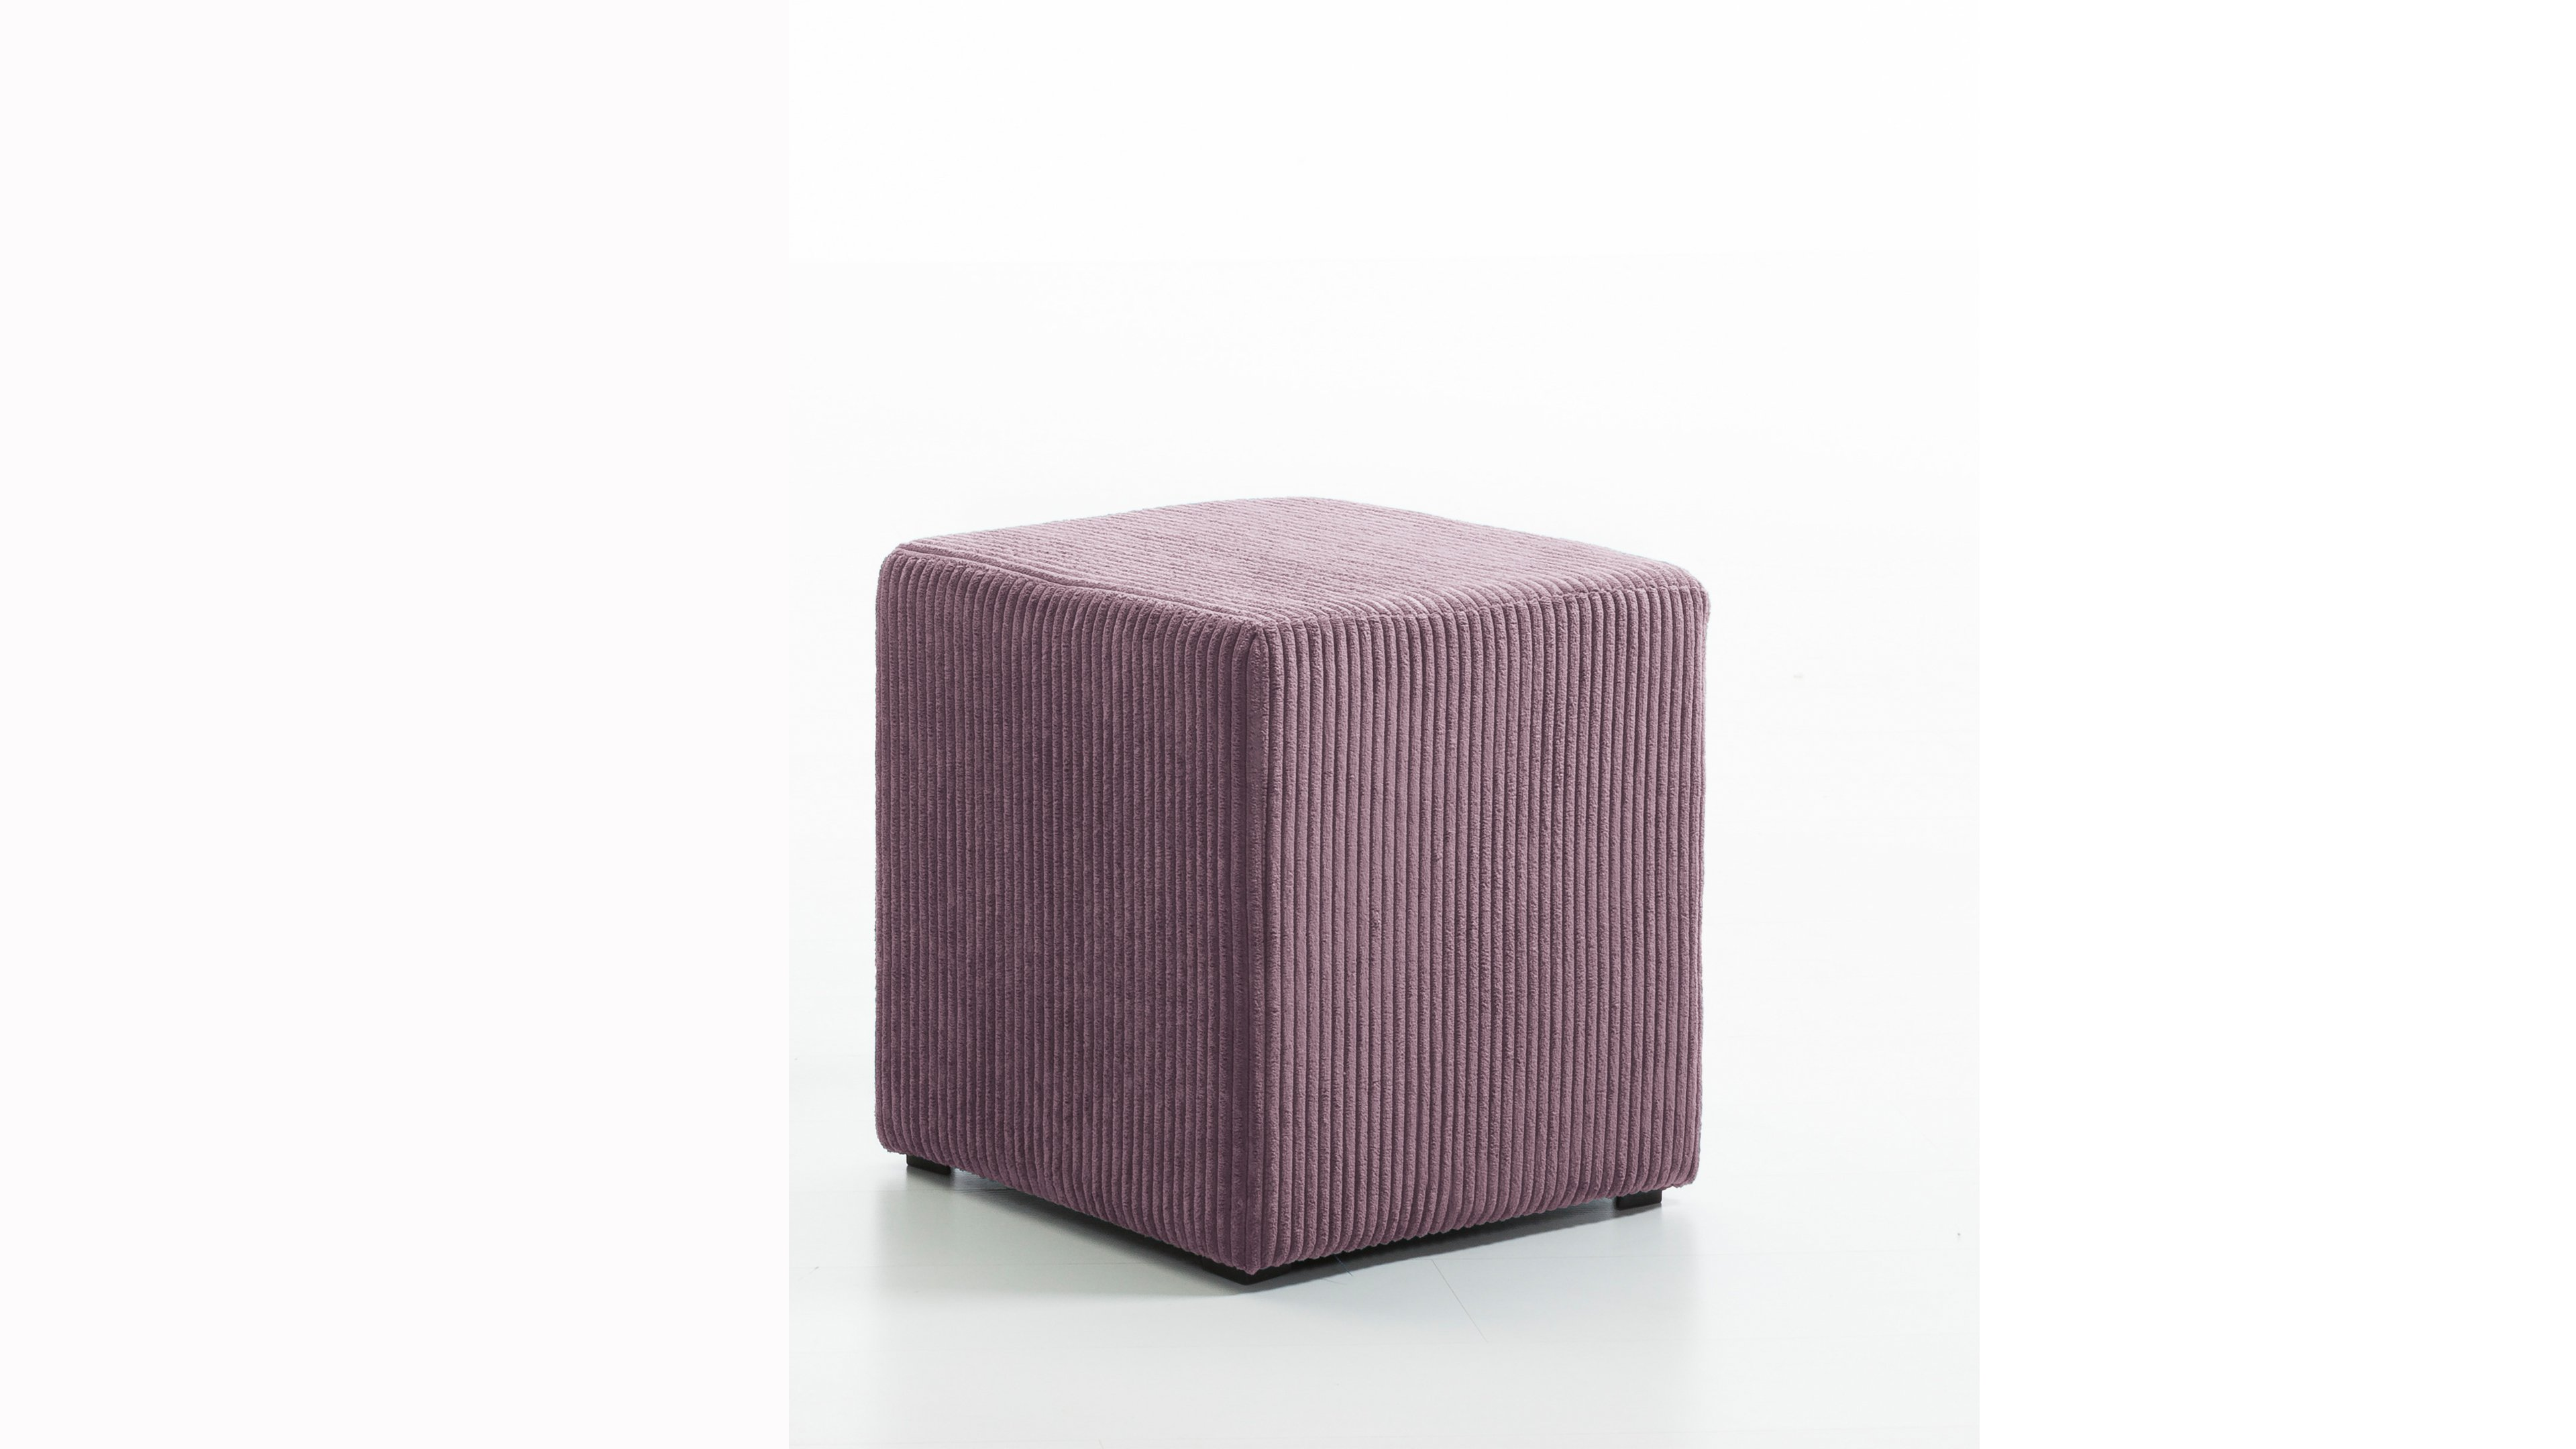 Hocker Torino Sessel Kunstfaser (Chemiefaser),KunstfaserChemiefaser/Polyamid (Perlon®!, Nylon®),KunstfaserChemiefaser/Polyester (PES),Stoff